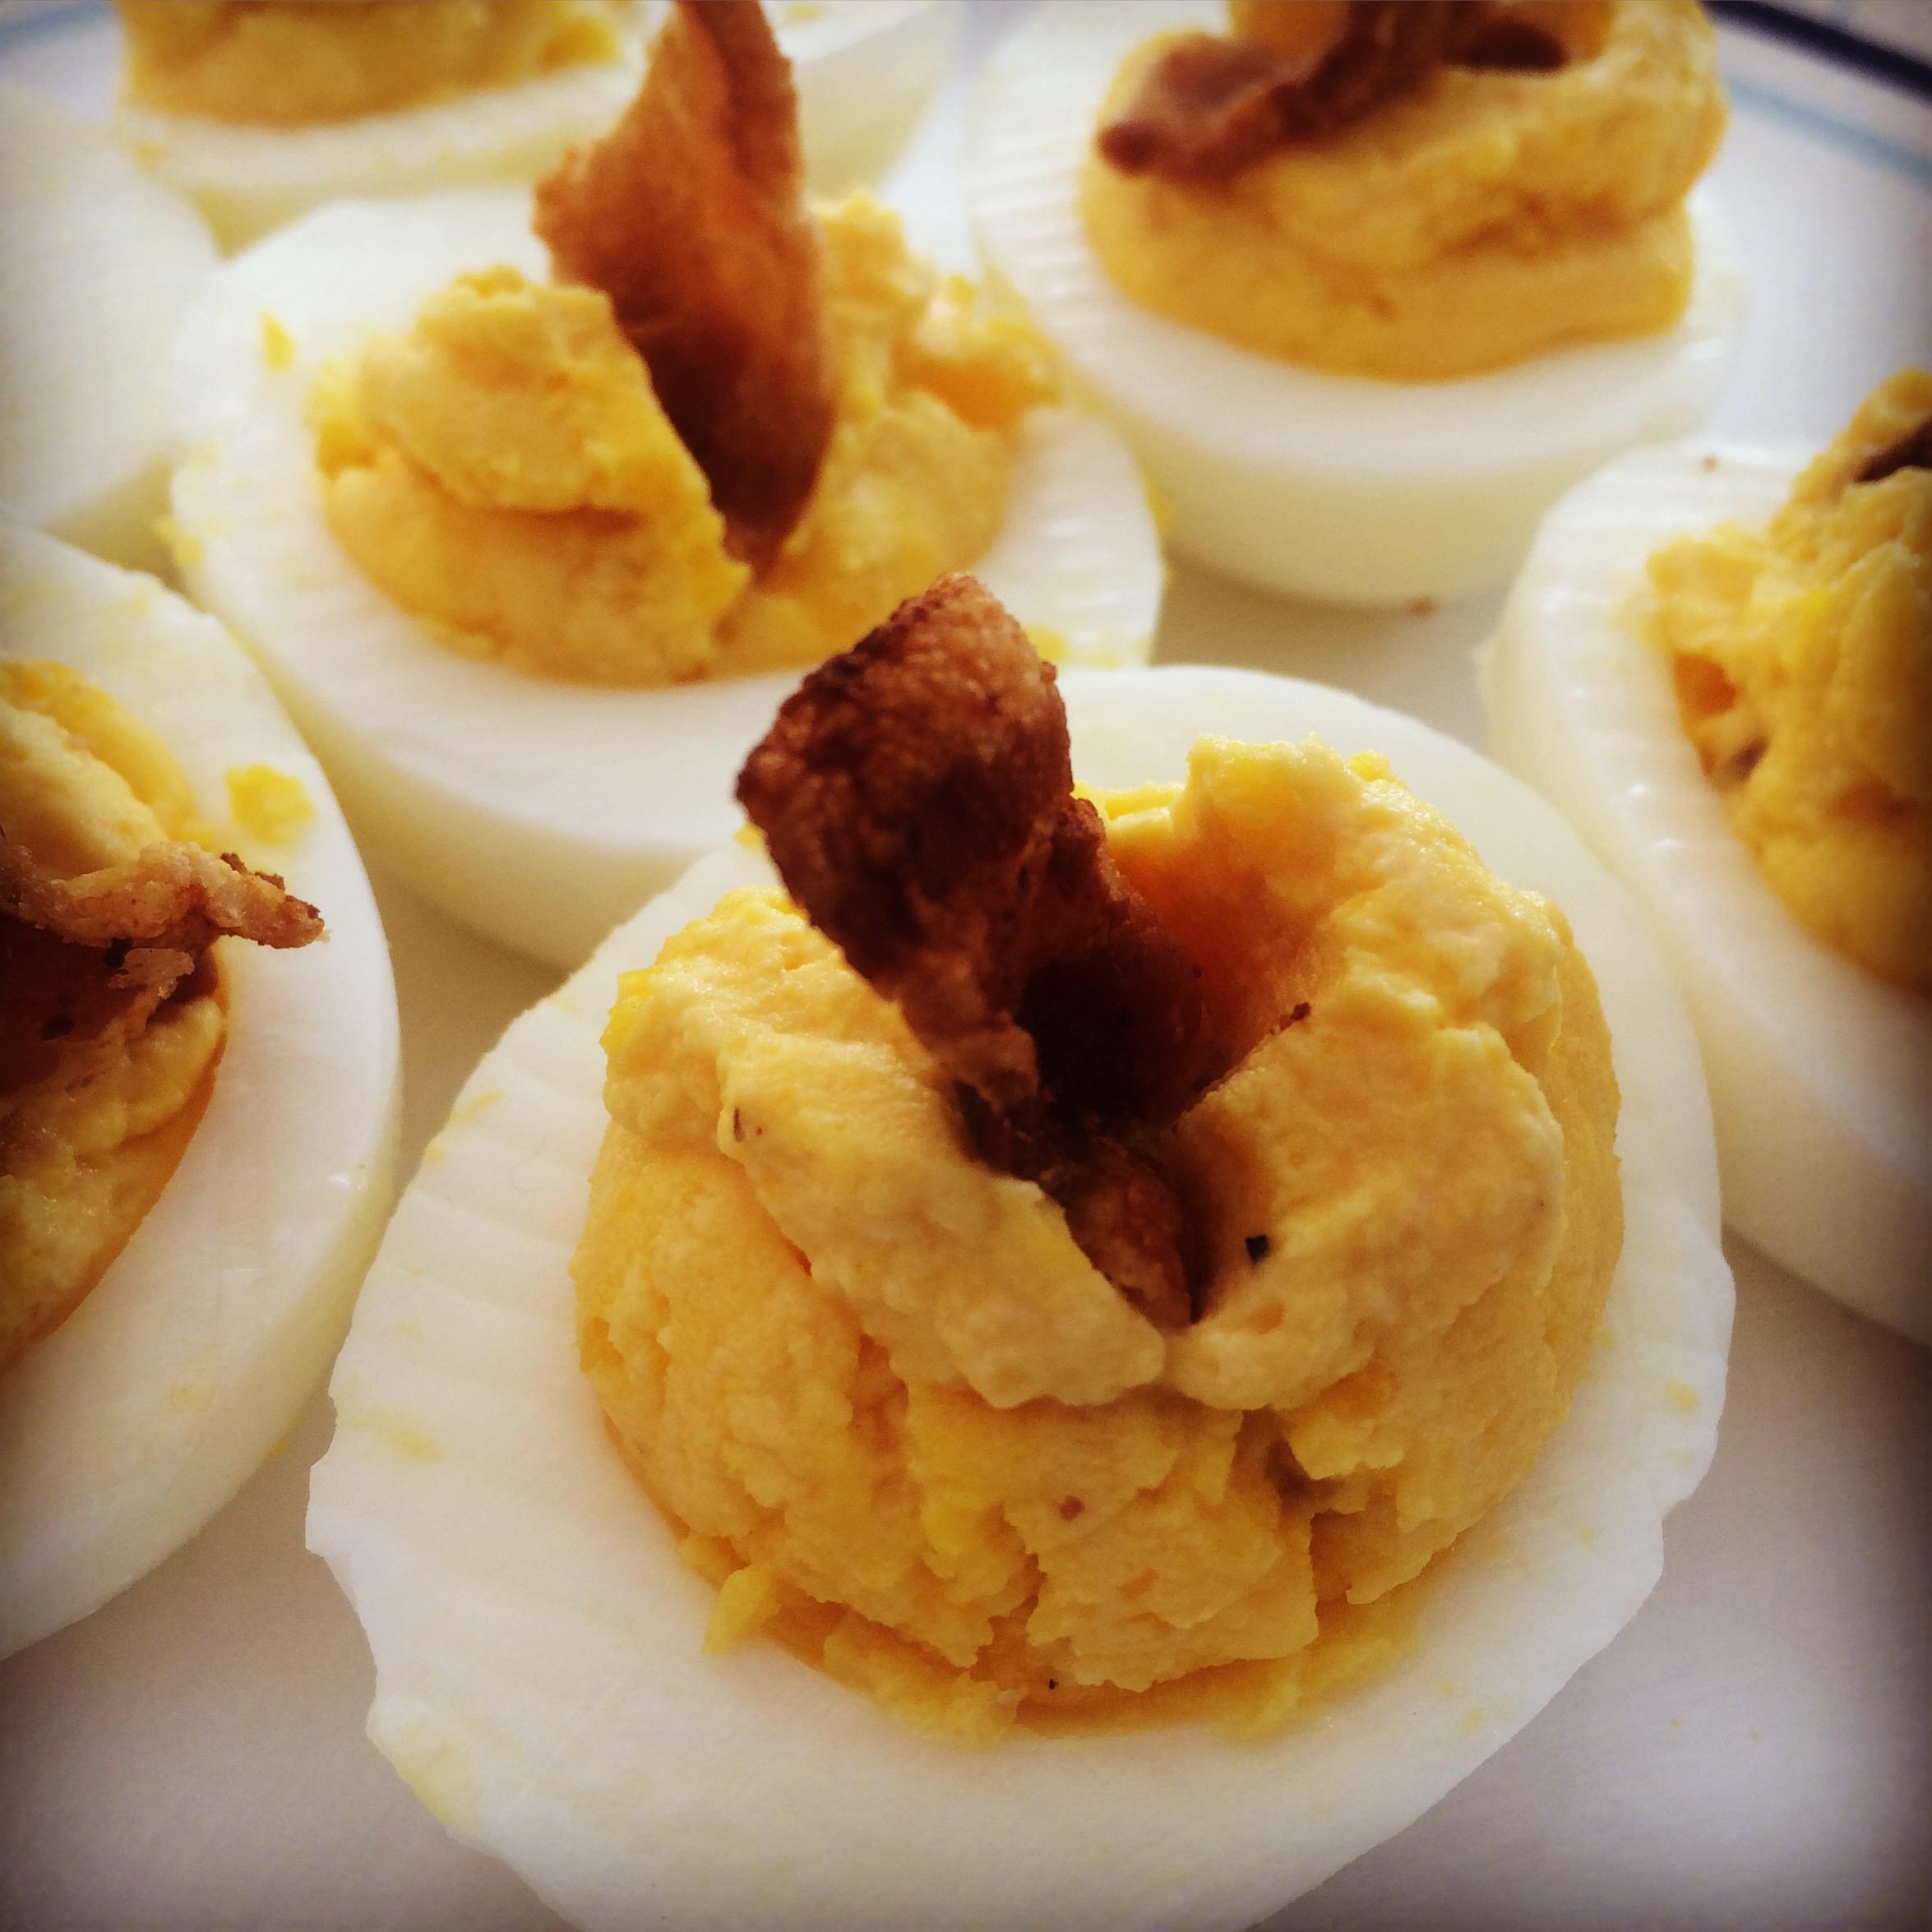 Healthy Hard Boiled Eggs made with Greek Yogurt instead of mayo!